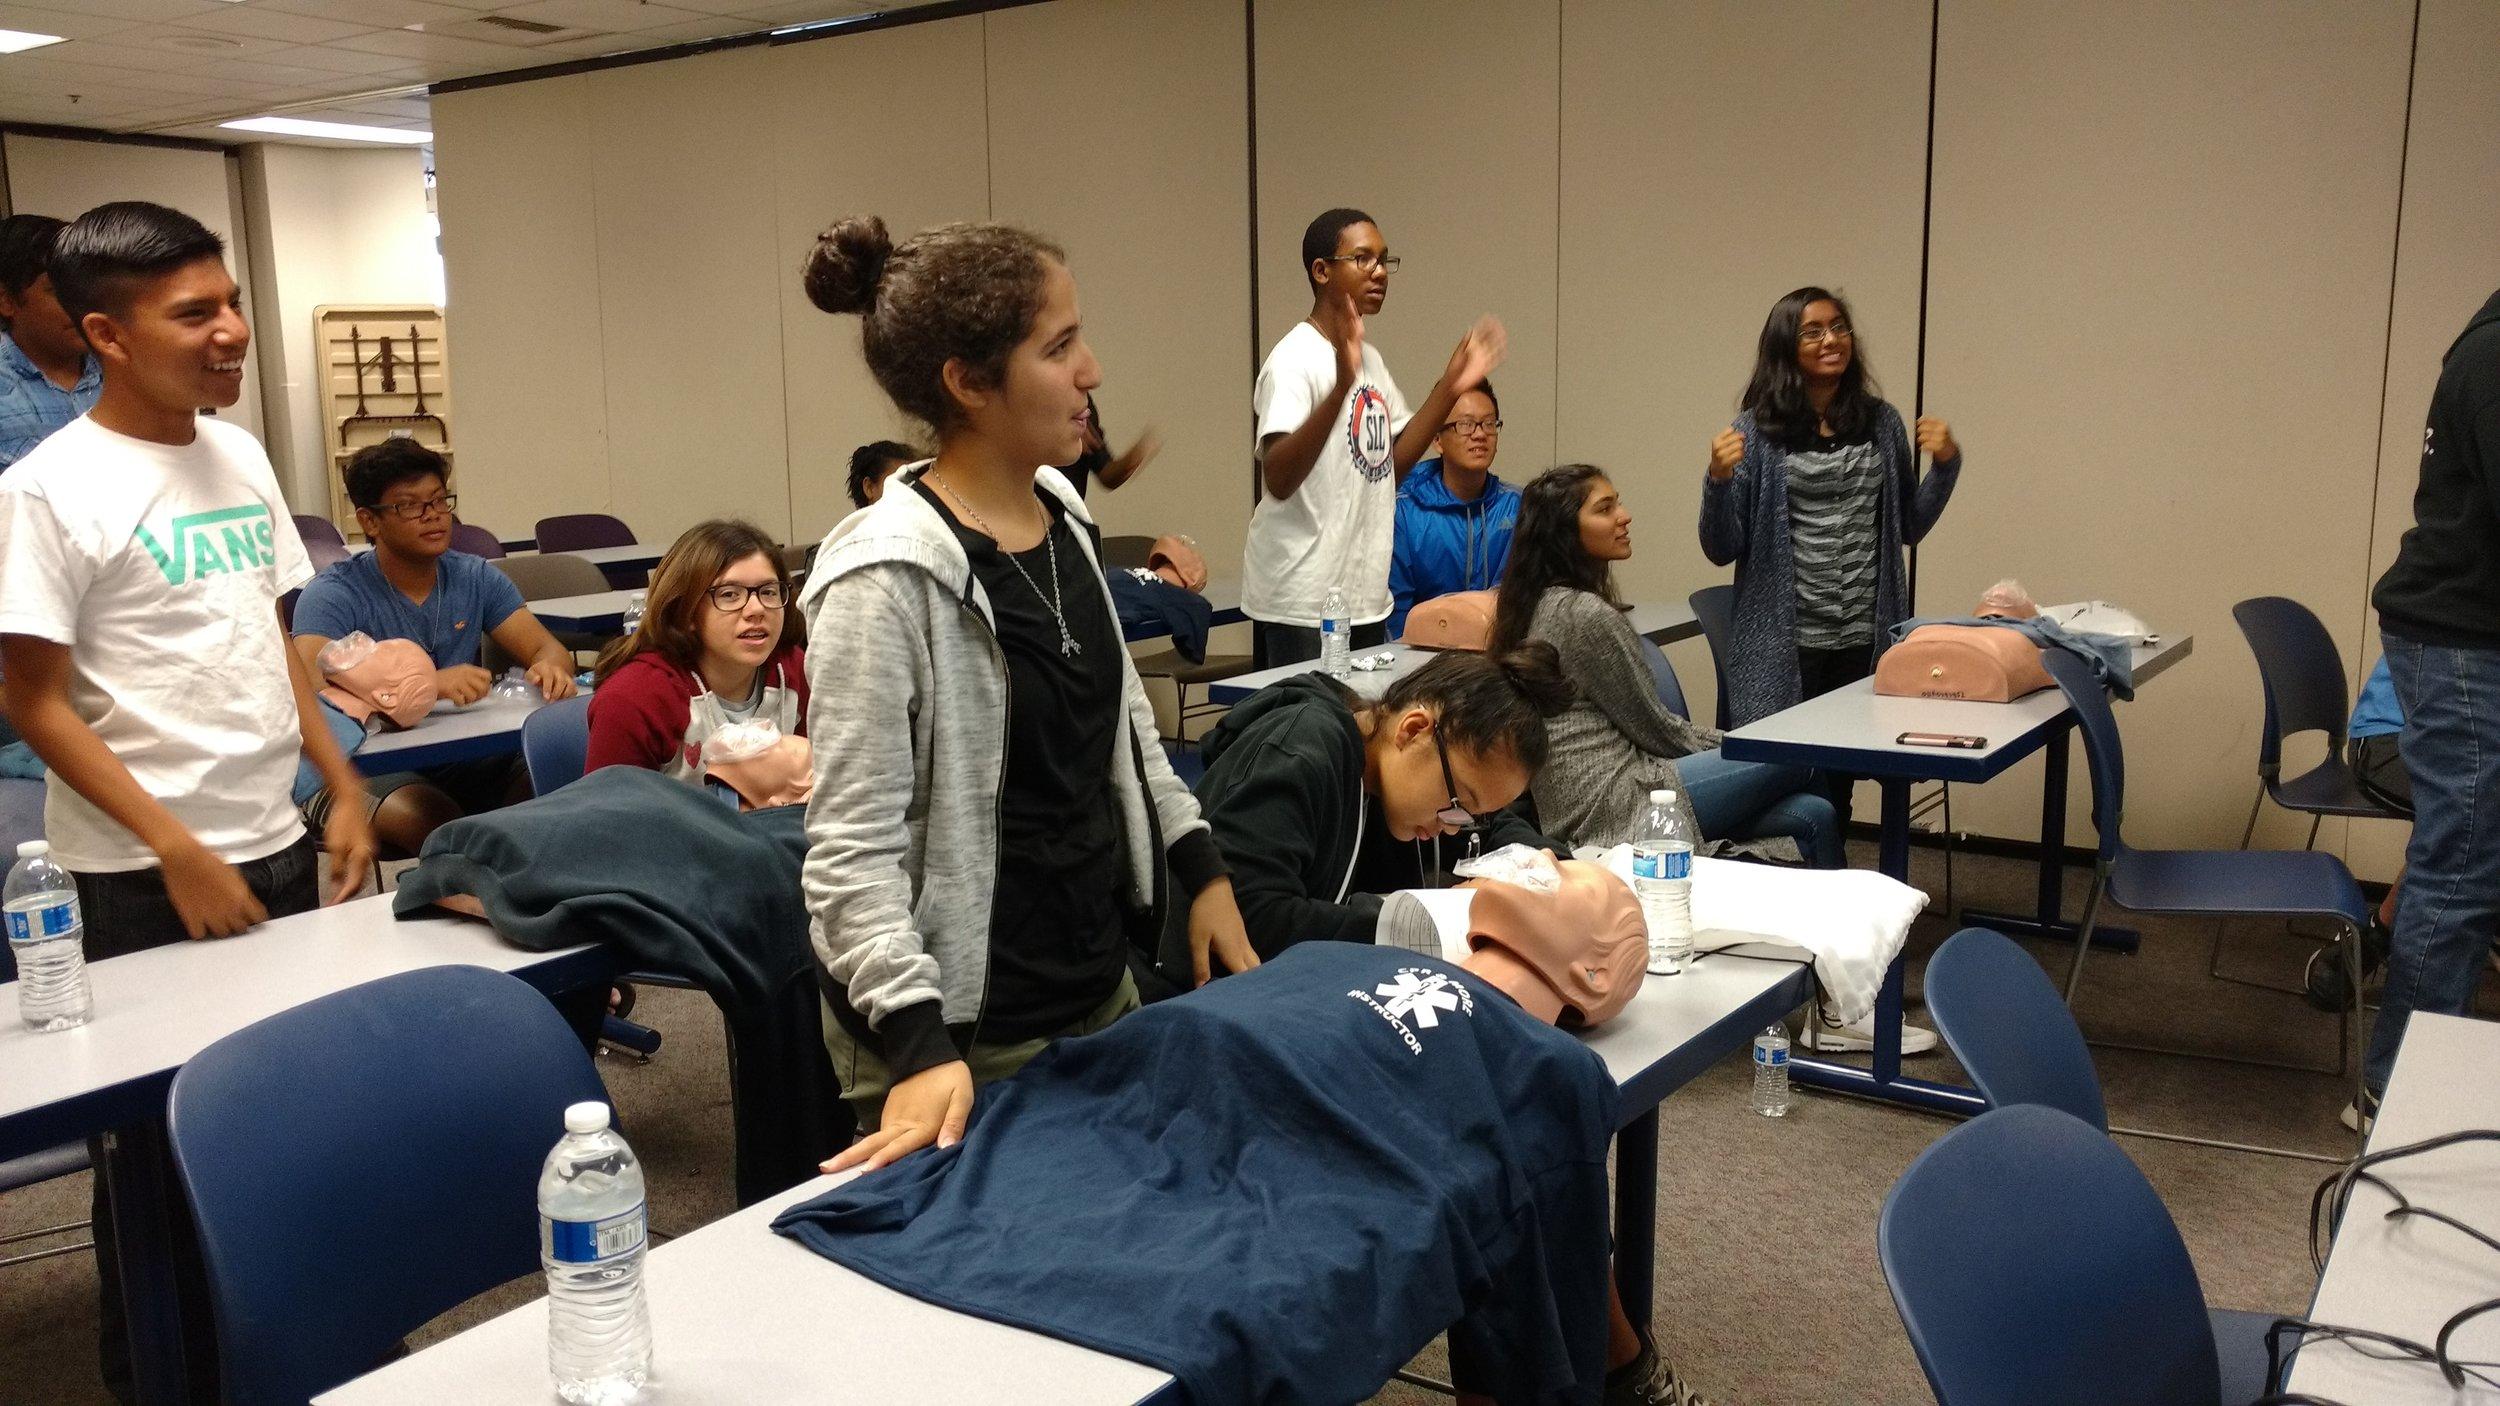 CPR training.